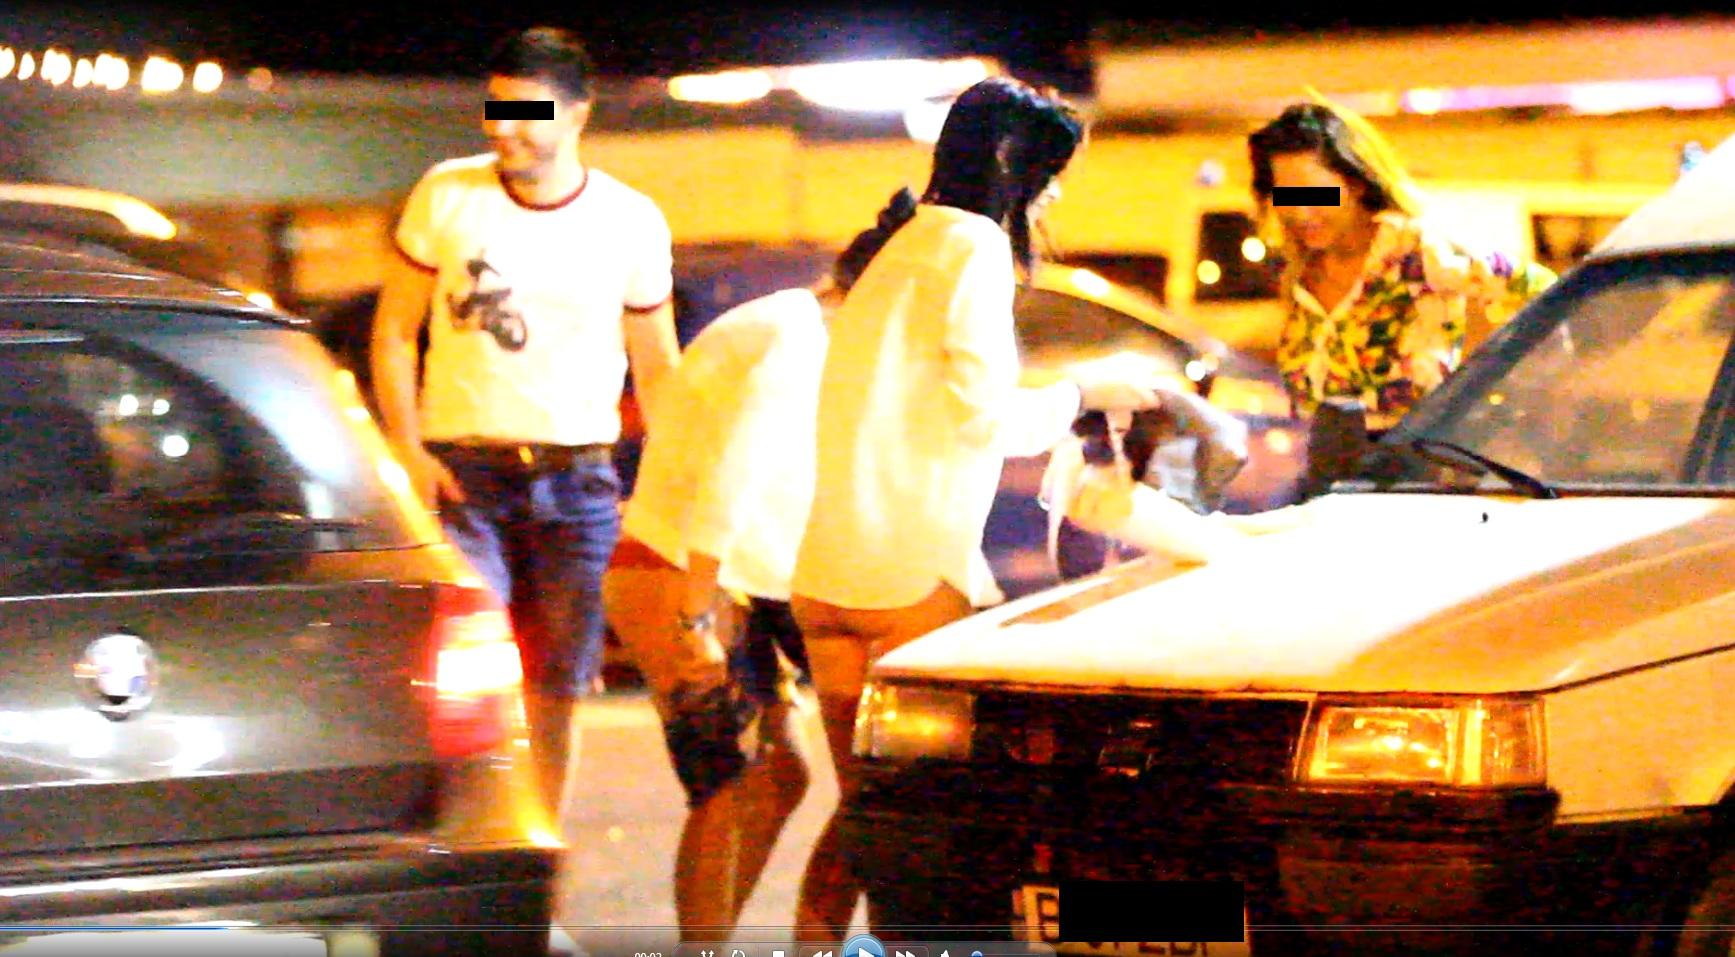 Fetele s-au imbracat in parcare cu haine mai lejere